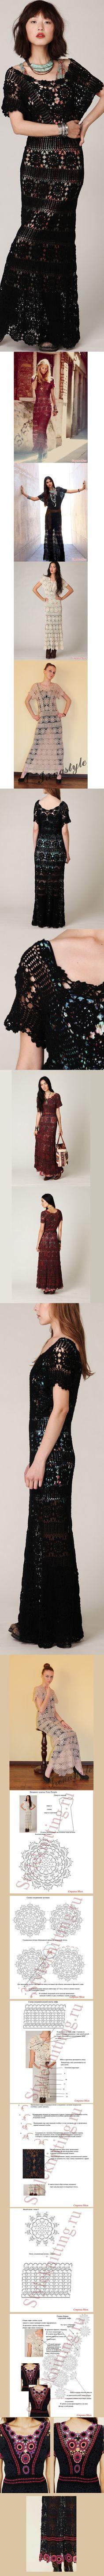 Нарядное длинное платье крючком. http://yarnstore.by/blog/vyazanoe-kryuchkom-plate-free-people